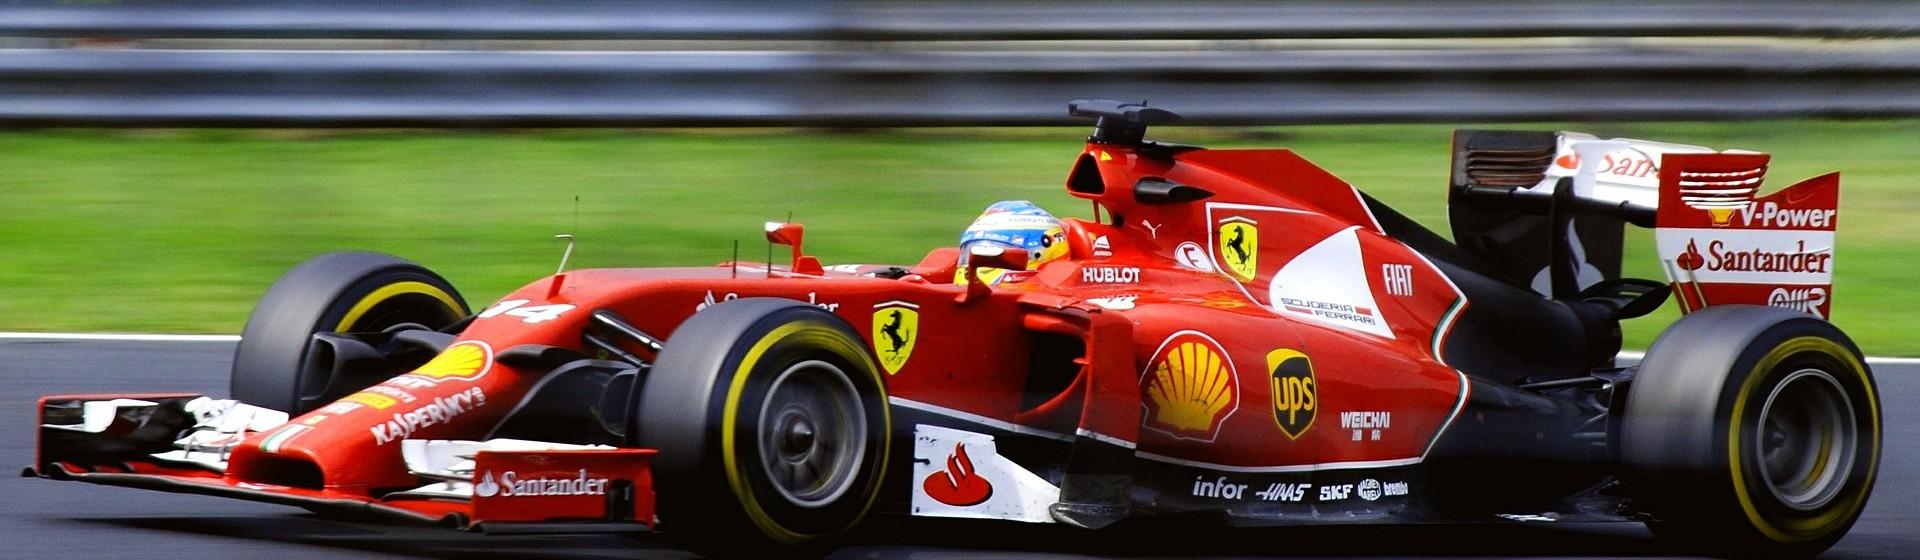 F1 MONZA – ITALY  12.09.2021